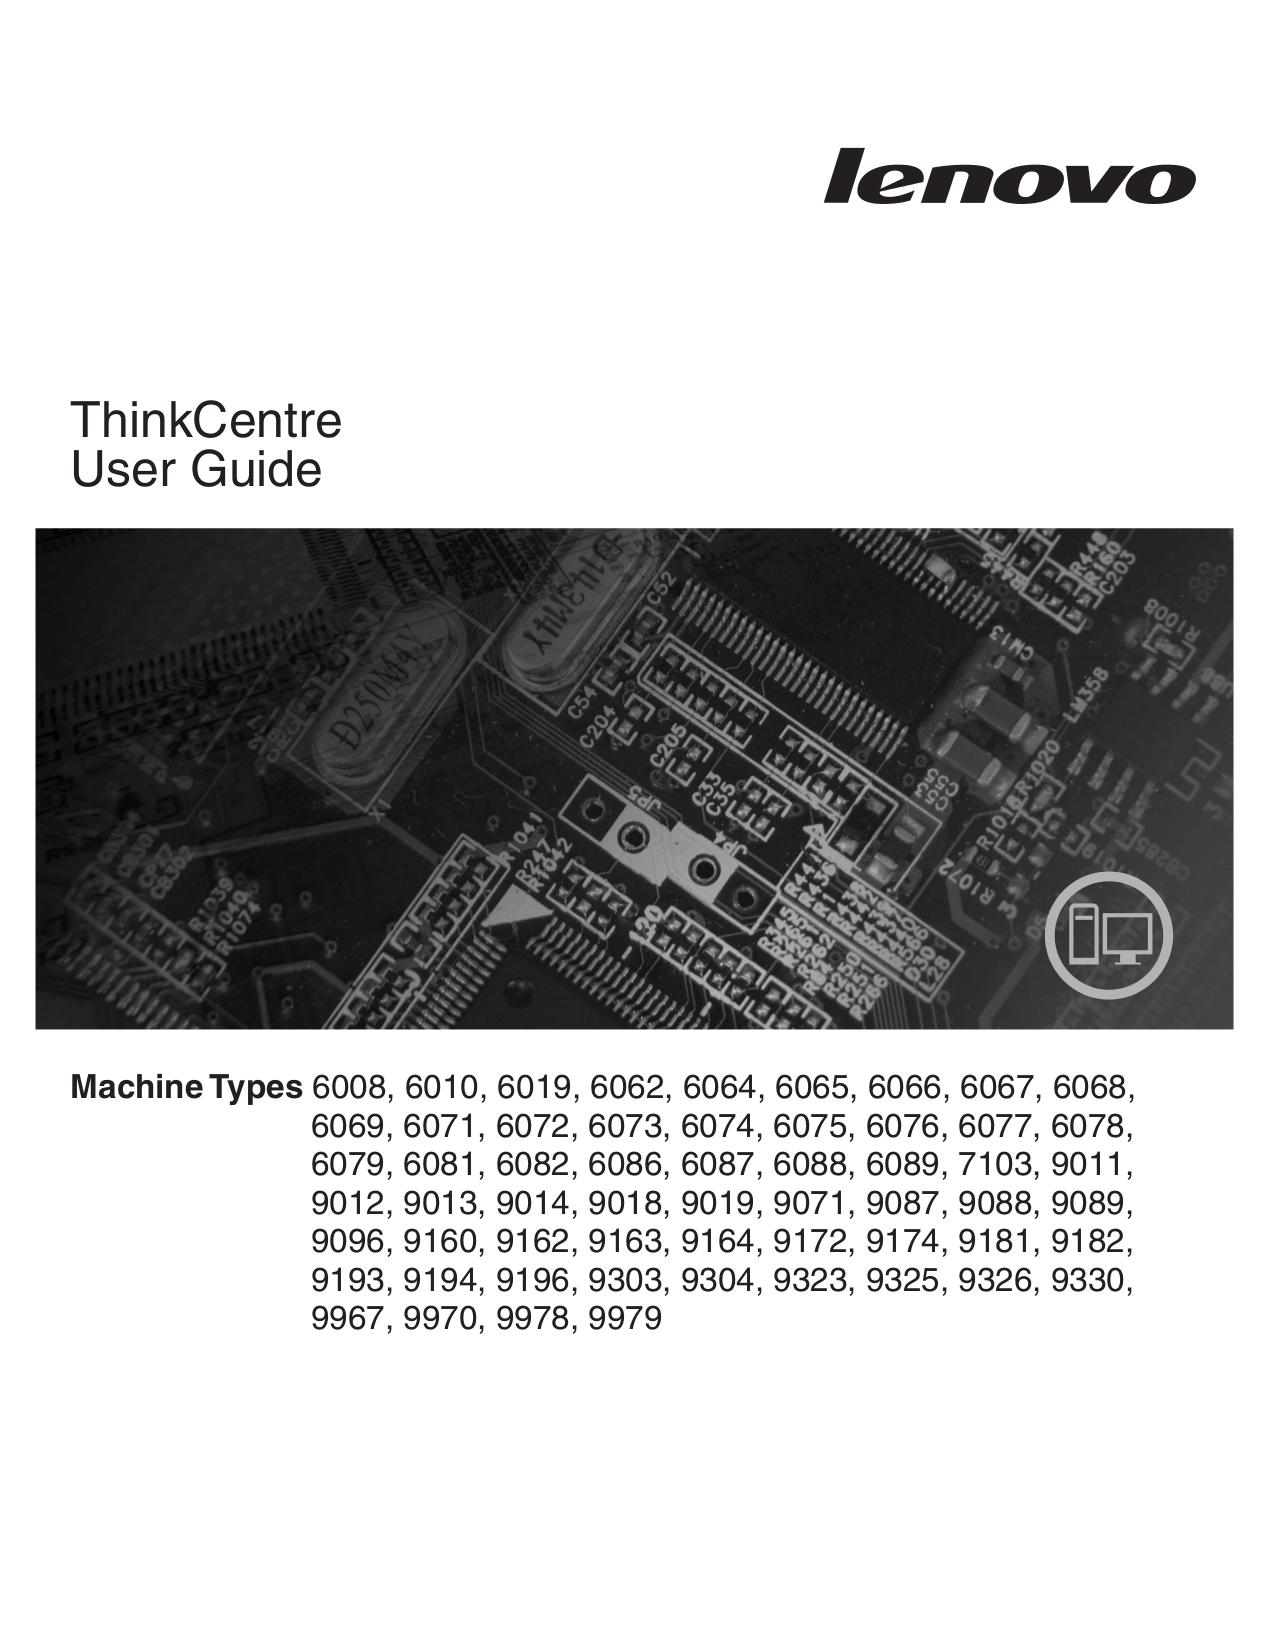 pdf for Lenovo Desktop ThinkCentre M57p 9303 manual